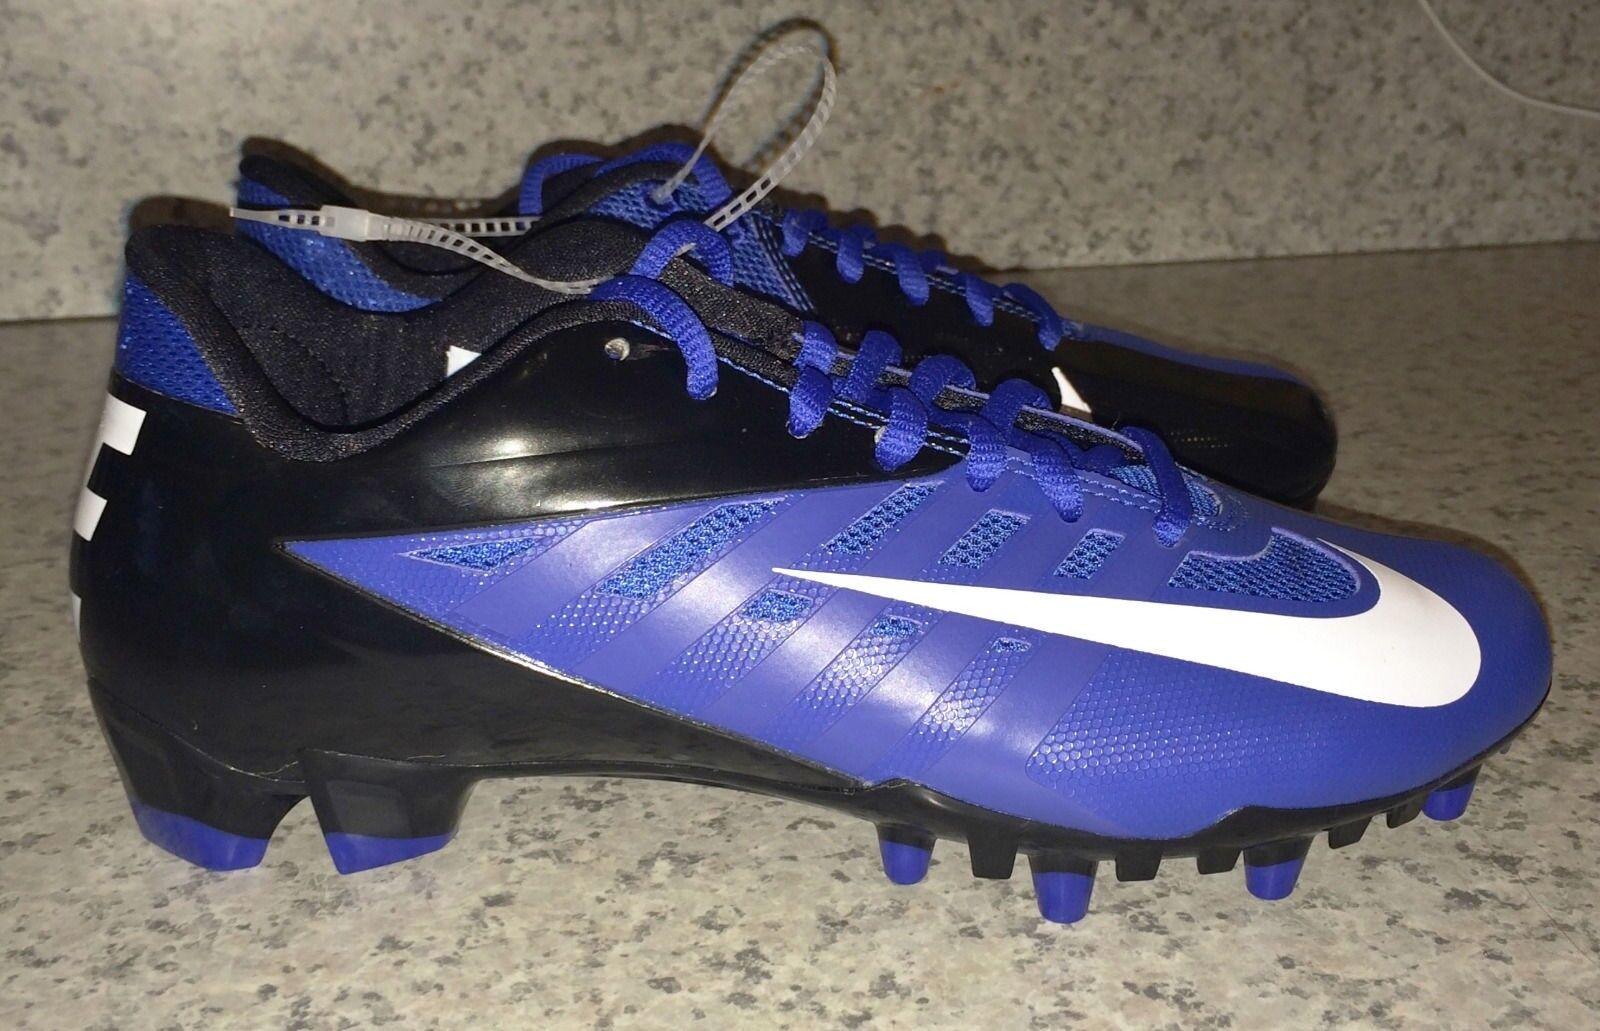 NIKE Vapor Pro Low TD Molded Football Cleats Black Royal bluee NEW Mens 11.5